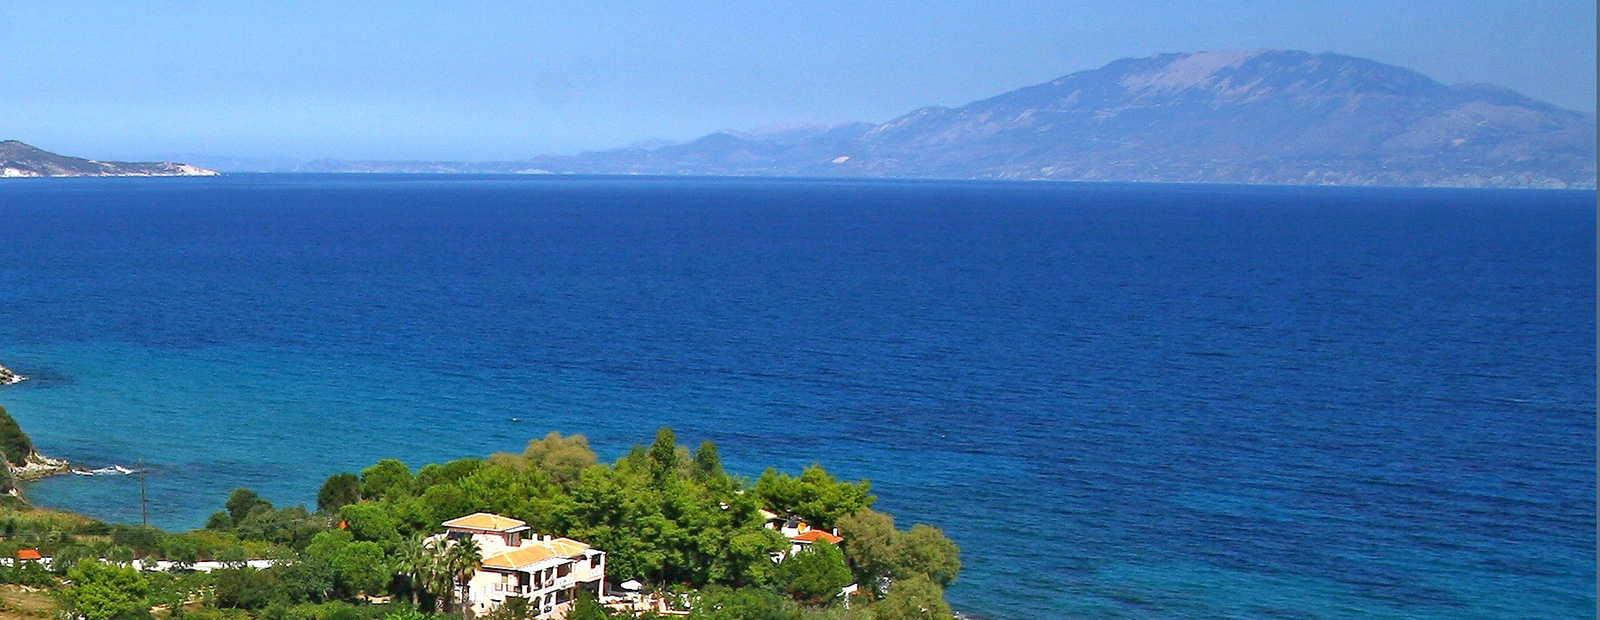 Luxurious holiday homes on Zakynthos island